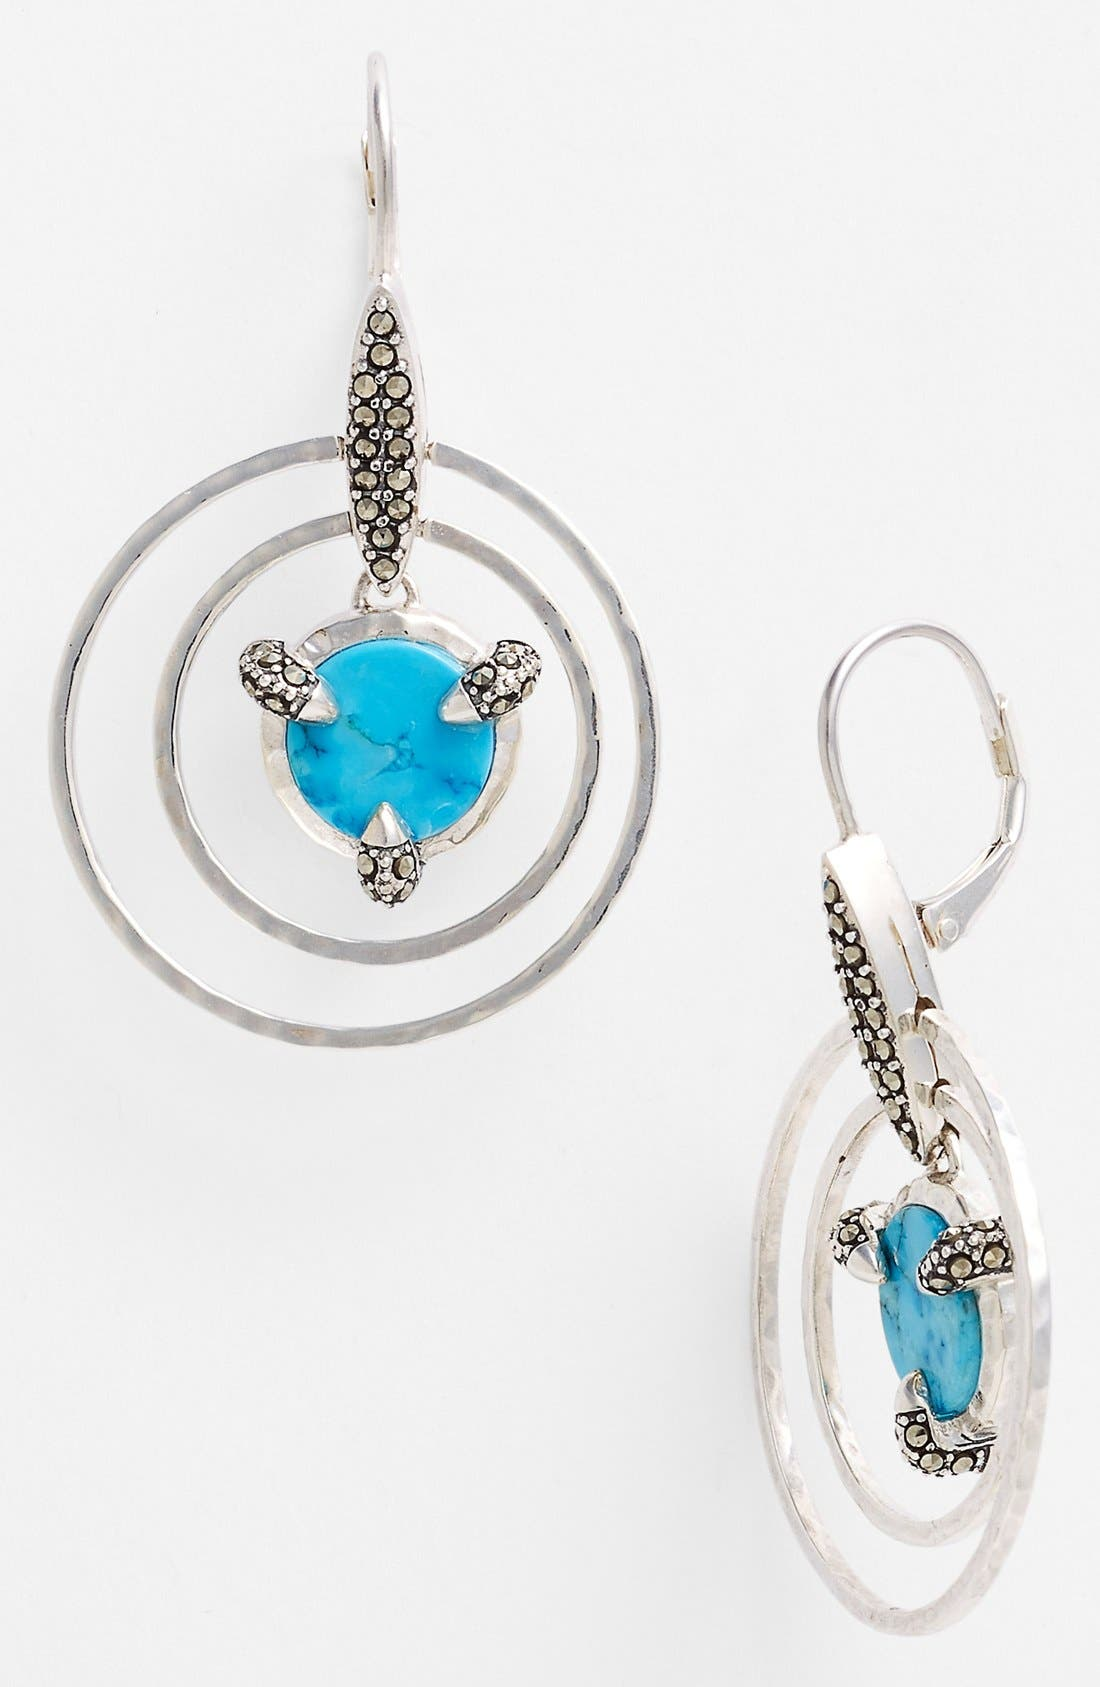 Main Image - Judith Jack 'Coin' Drop Earrings